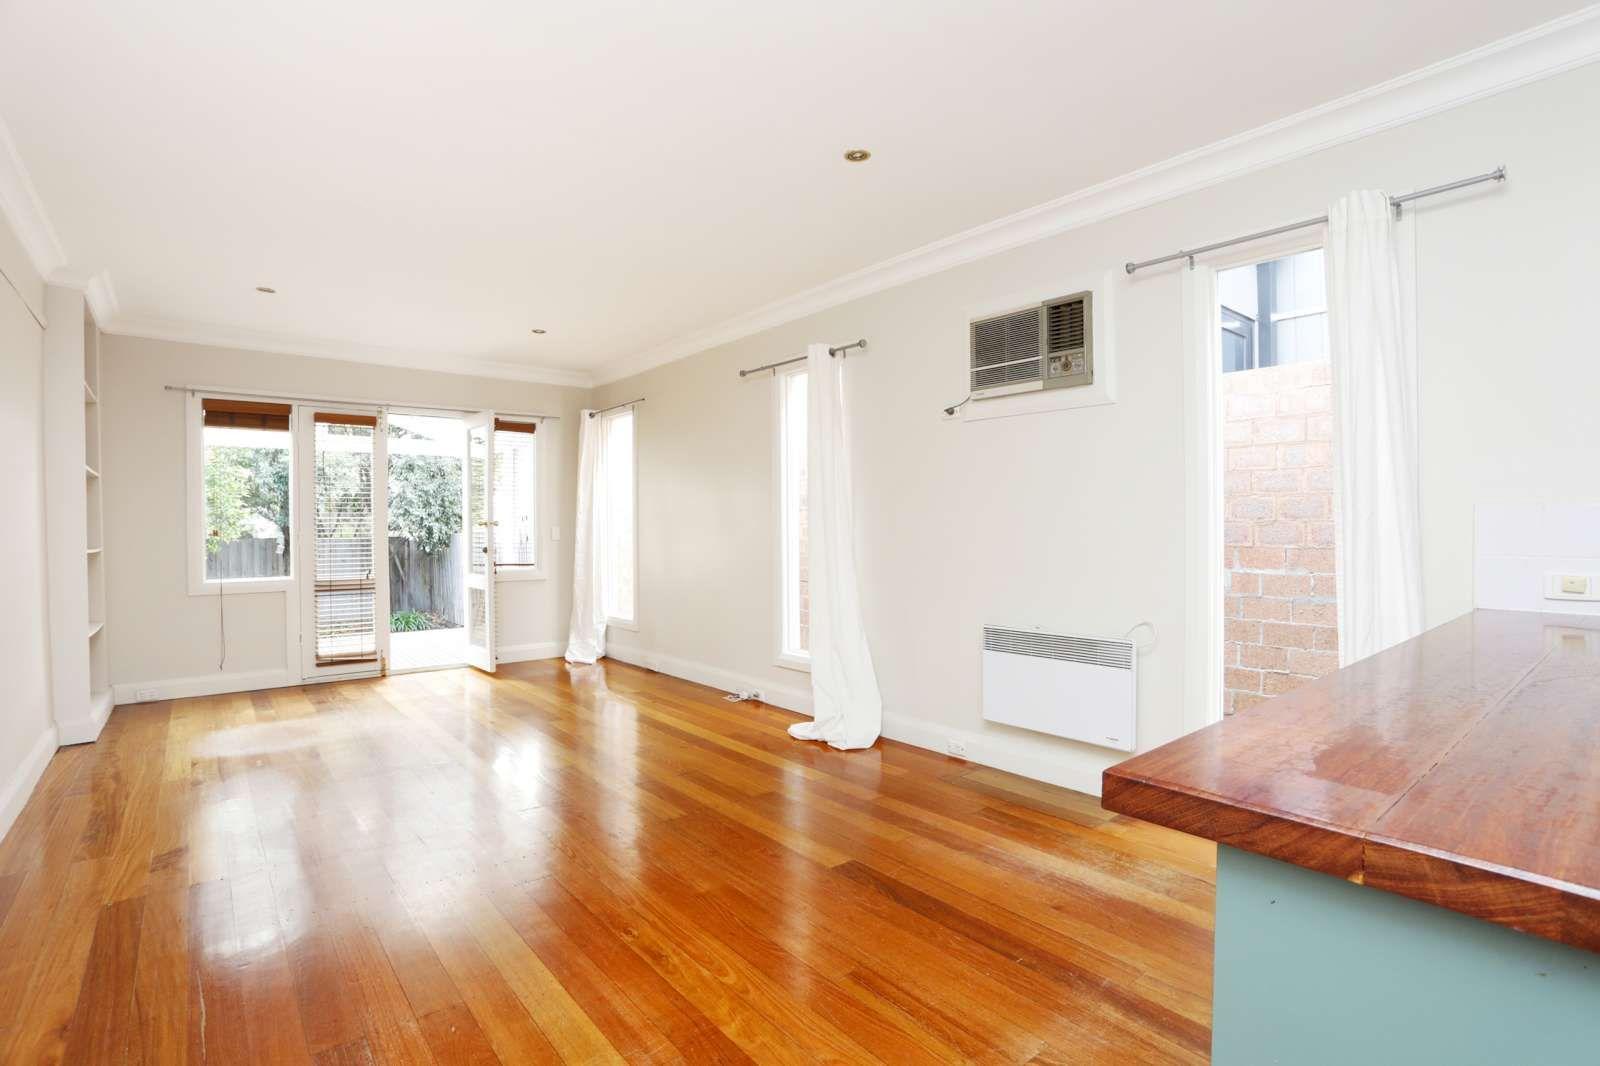 38 Curran St, North Melbourne VIC 3051, Image 2